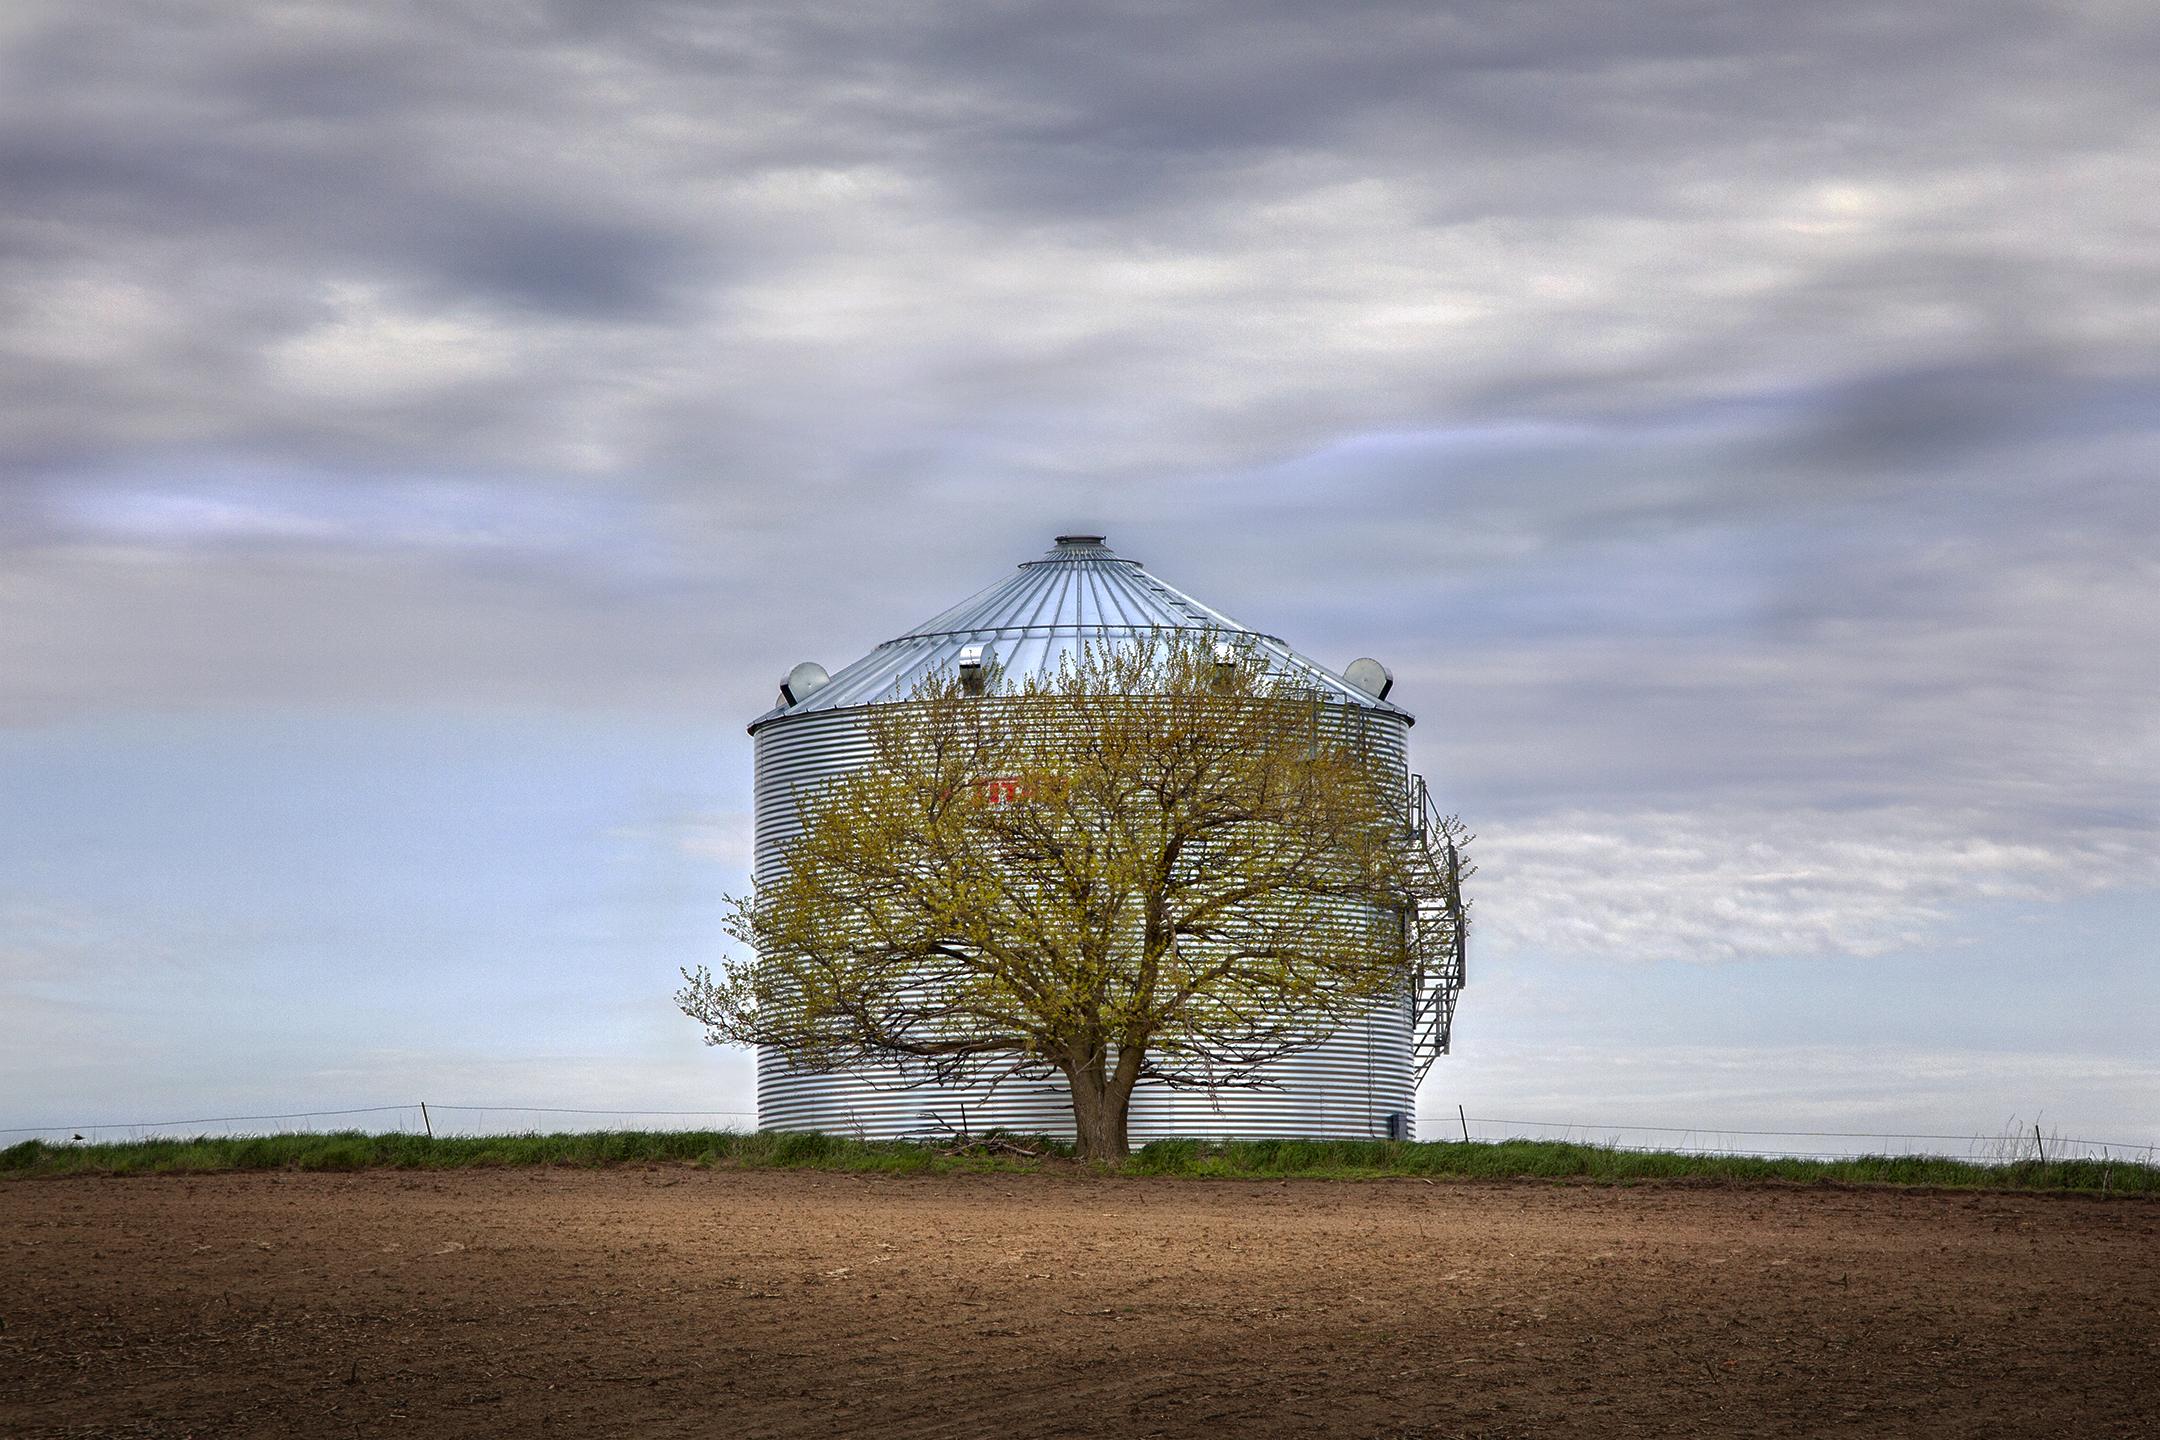 Tree and Silo